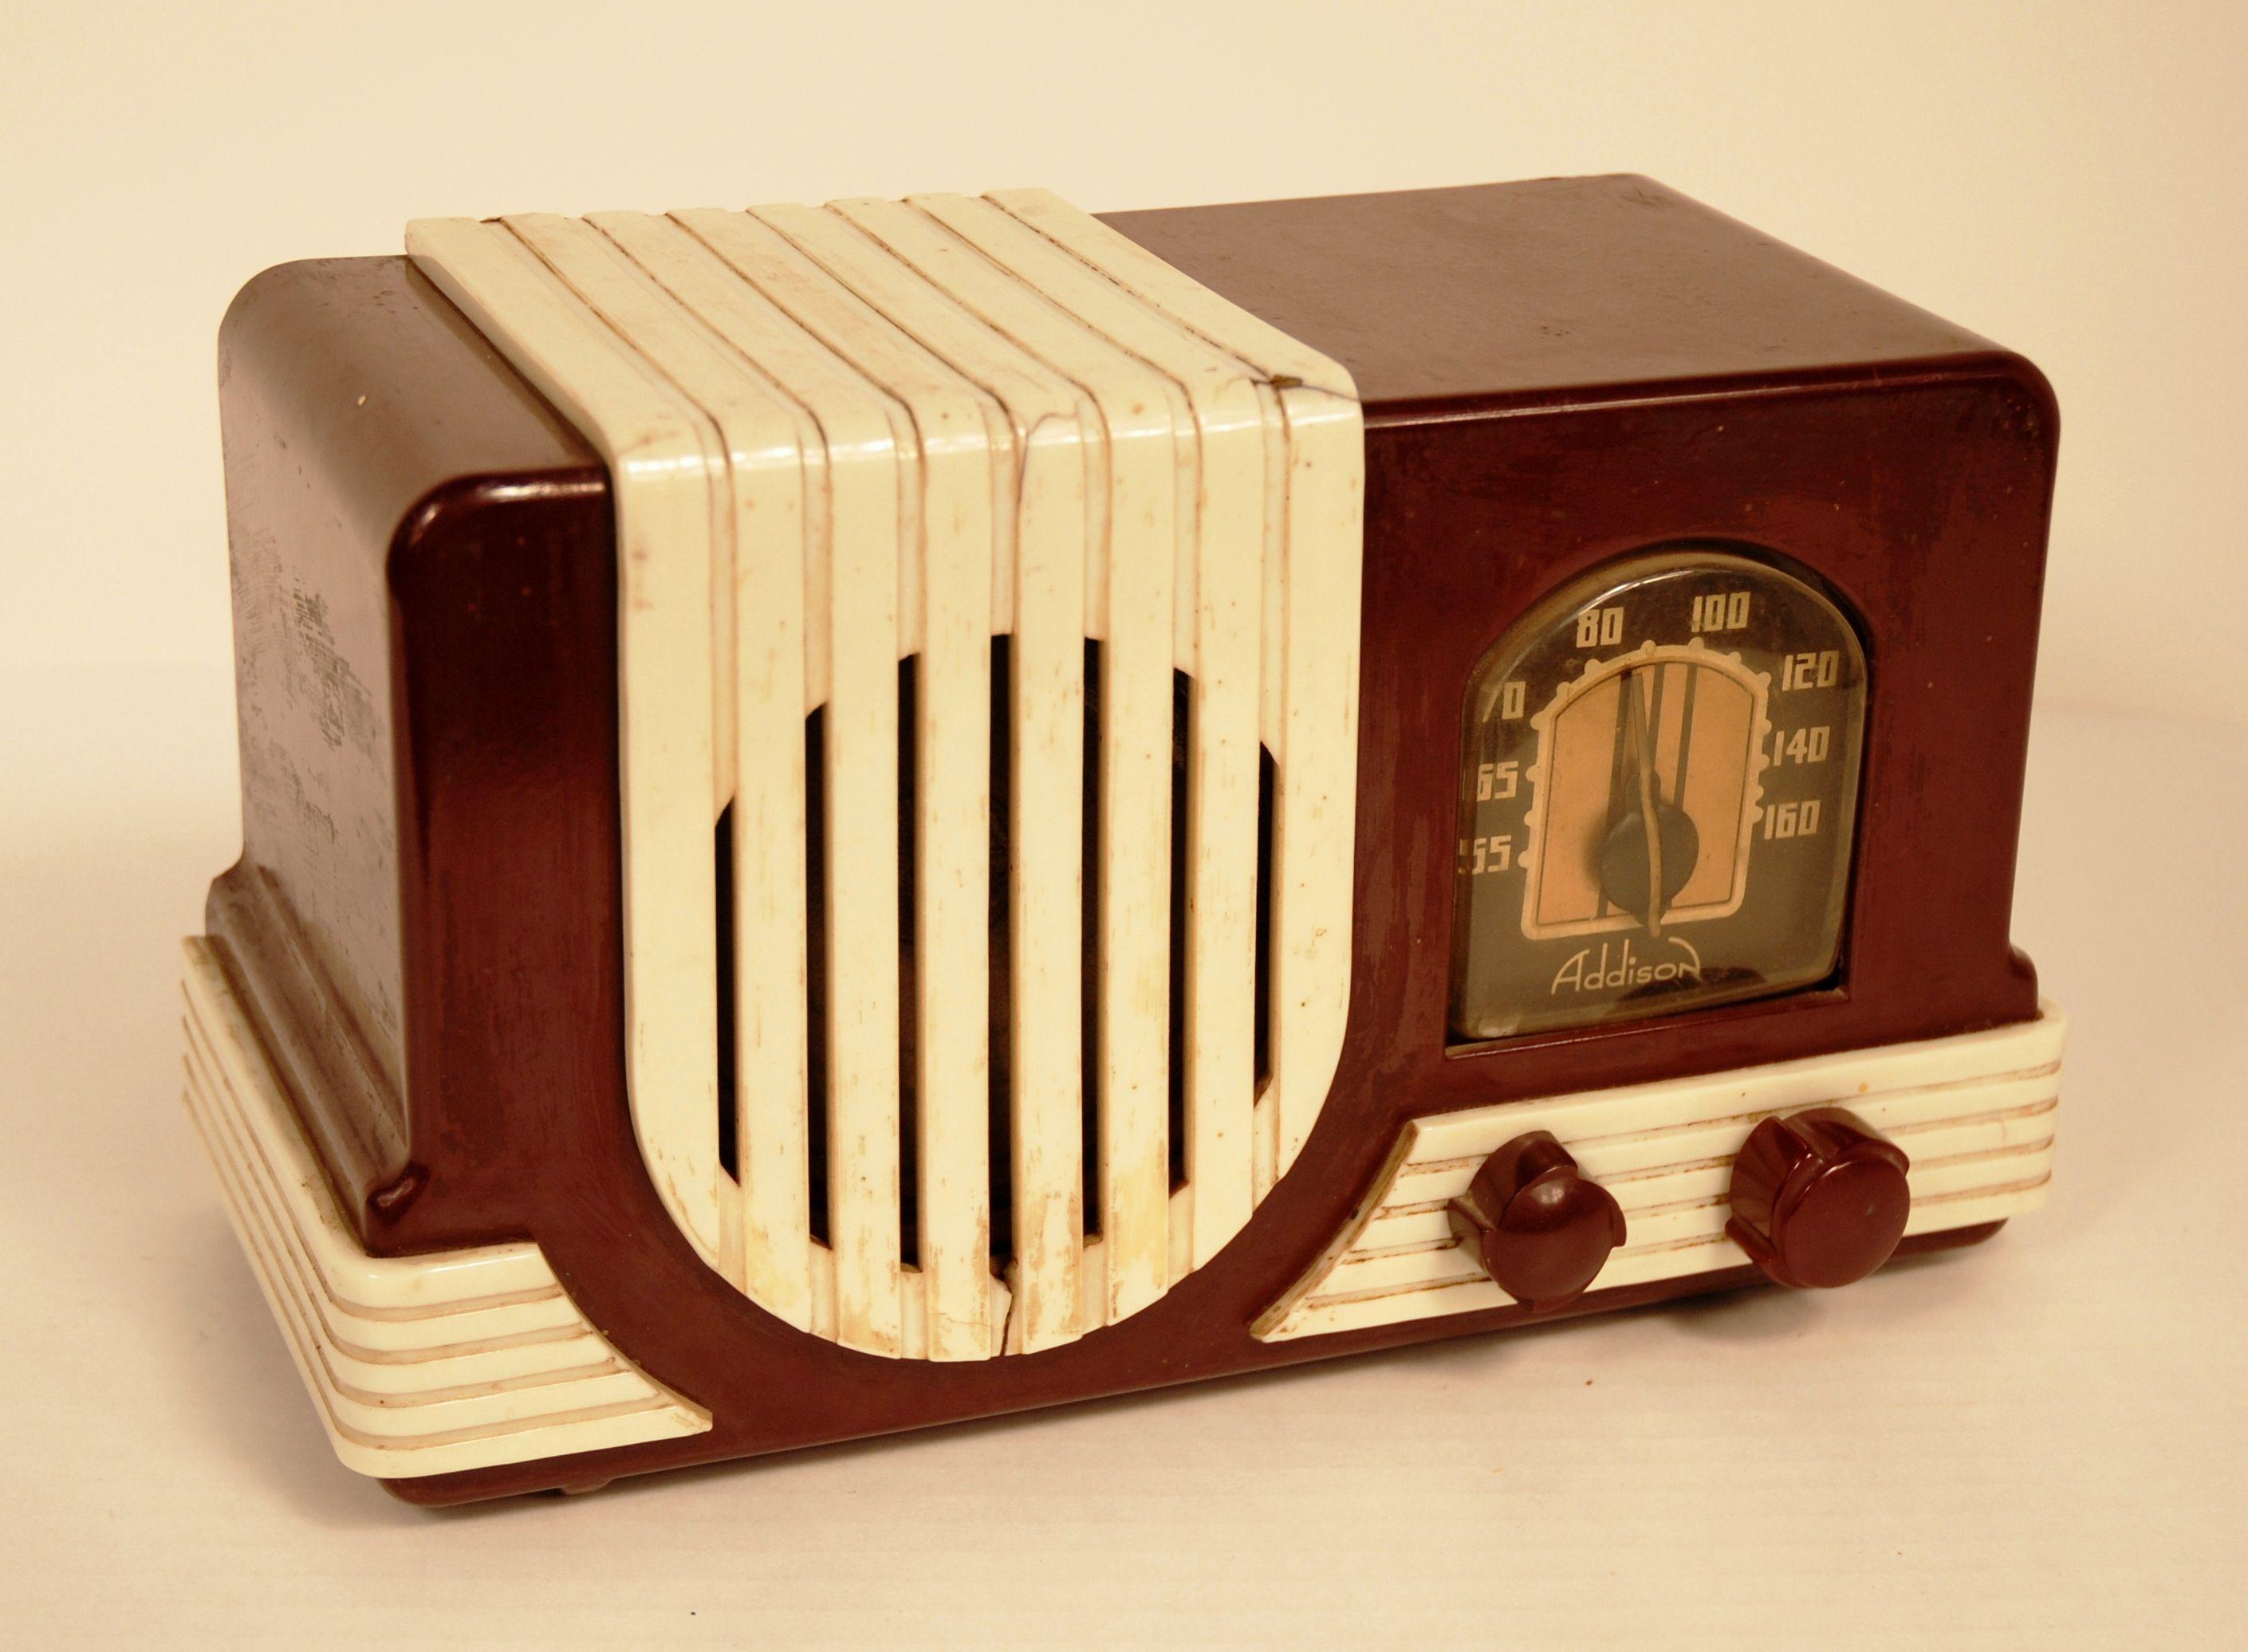 1940's Addison radio